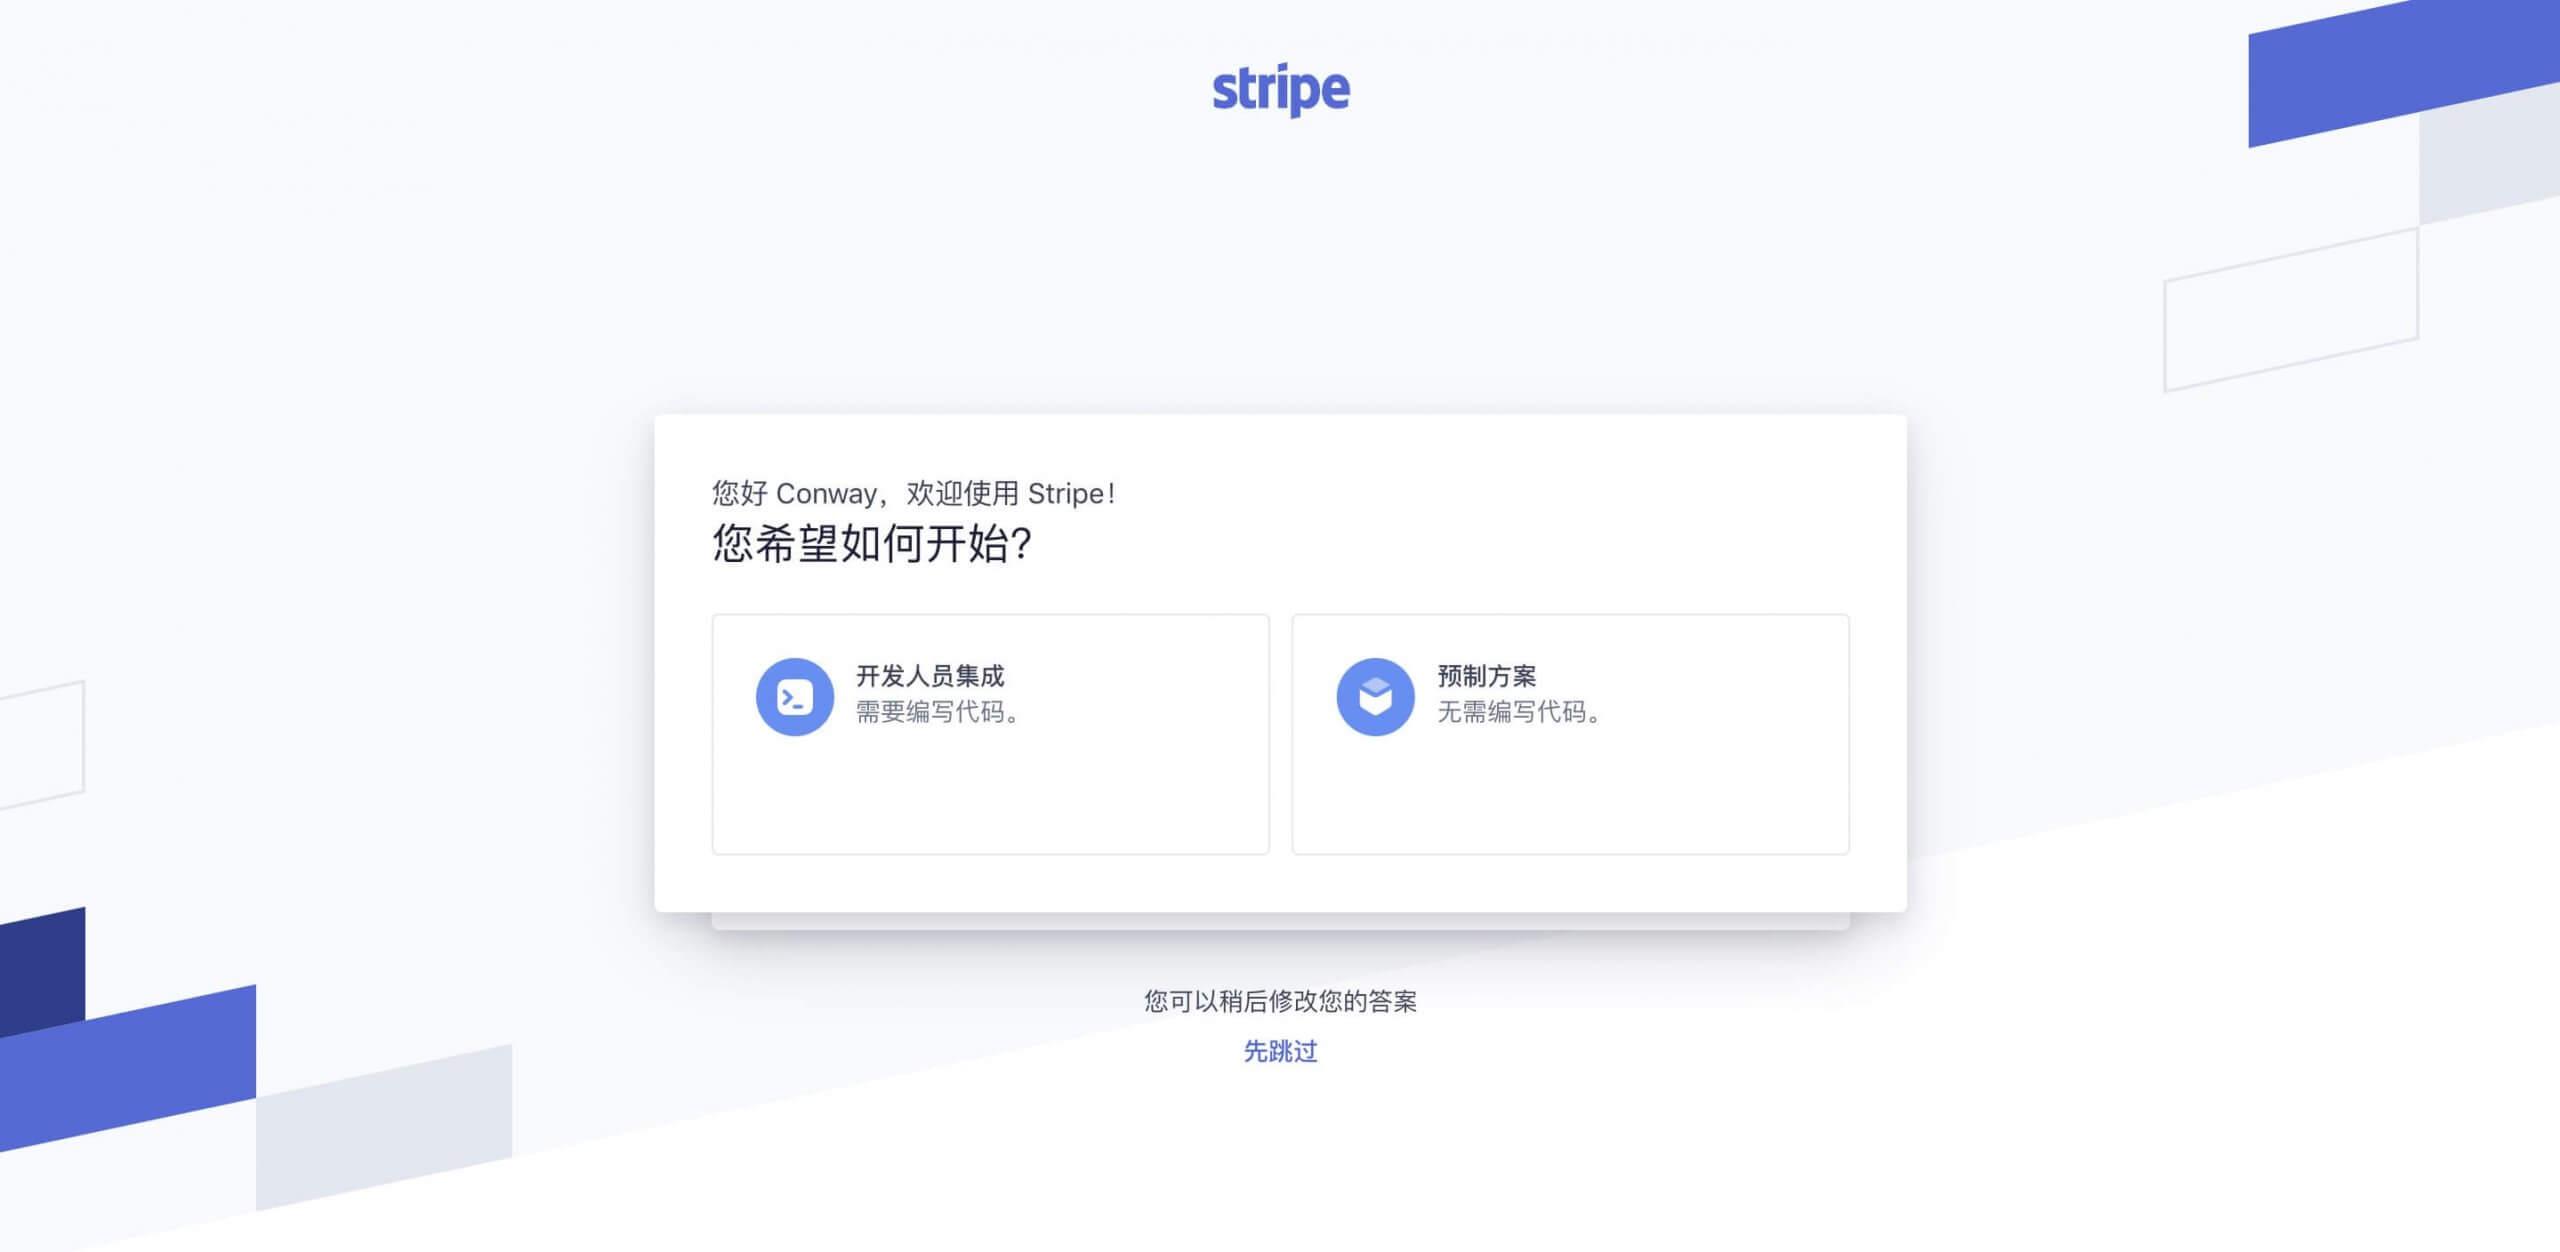 stripe注册